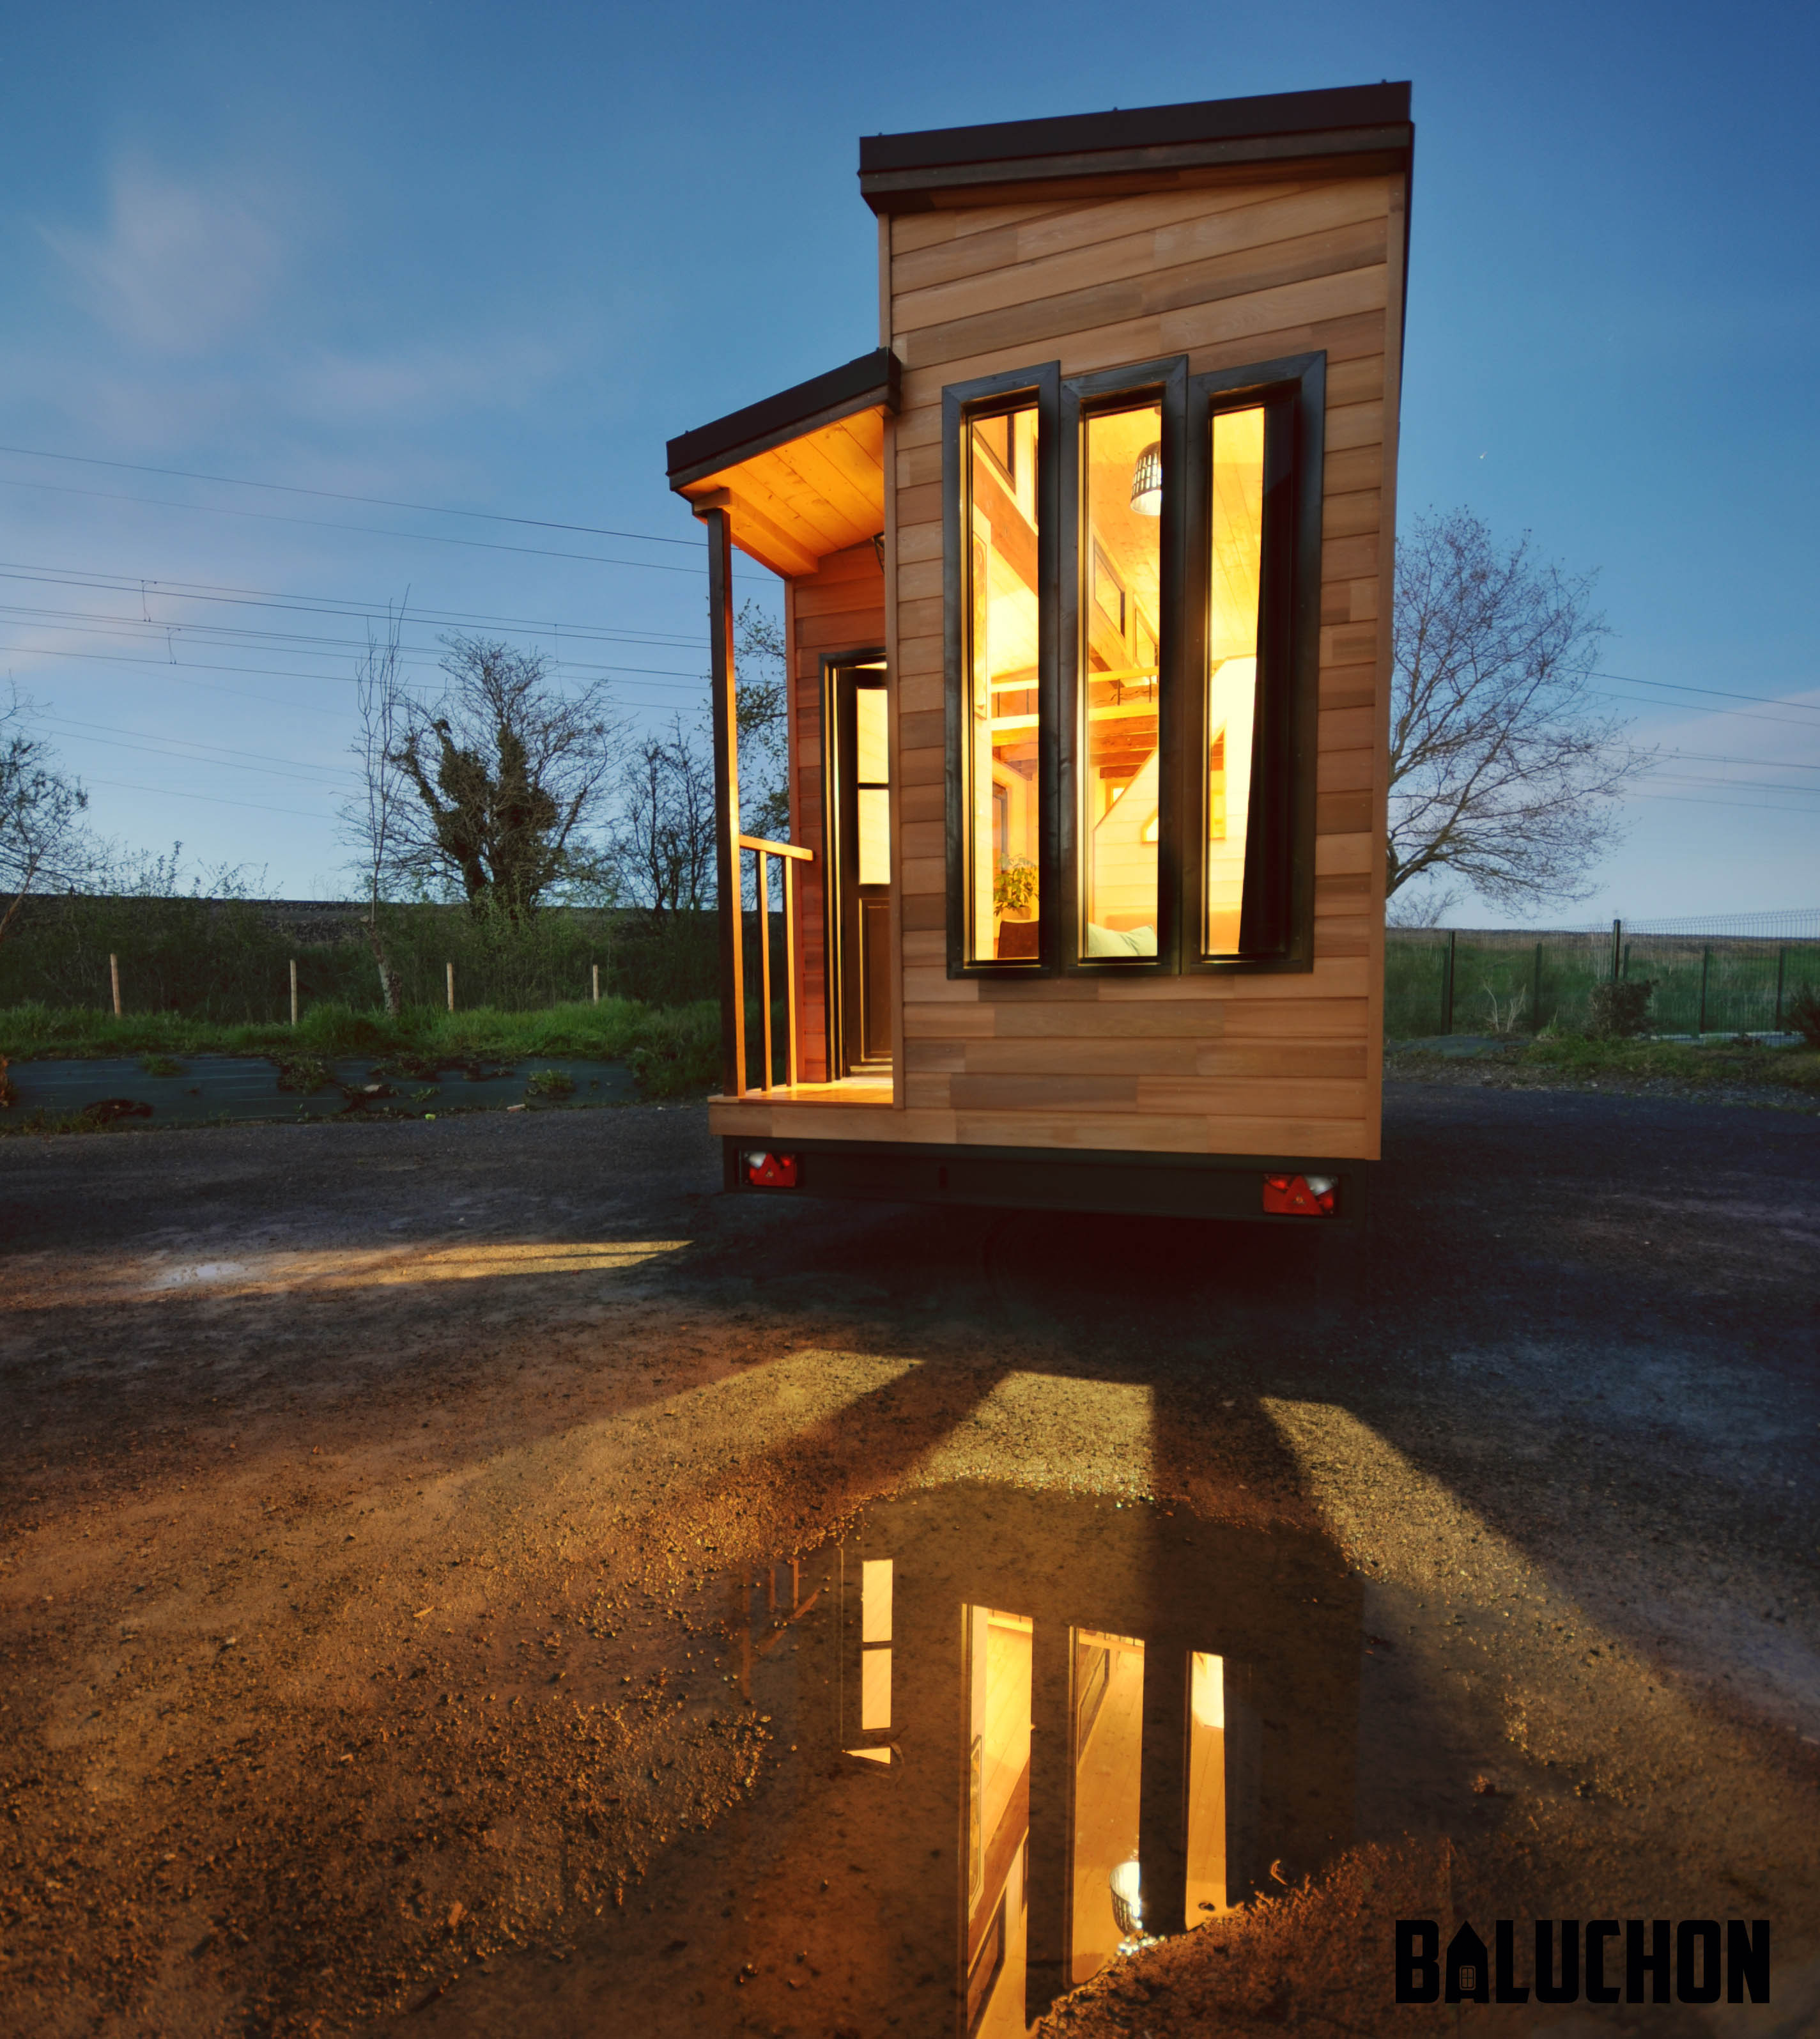 01_tiny_house_baluchon